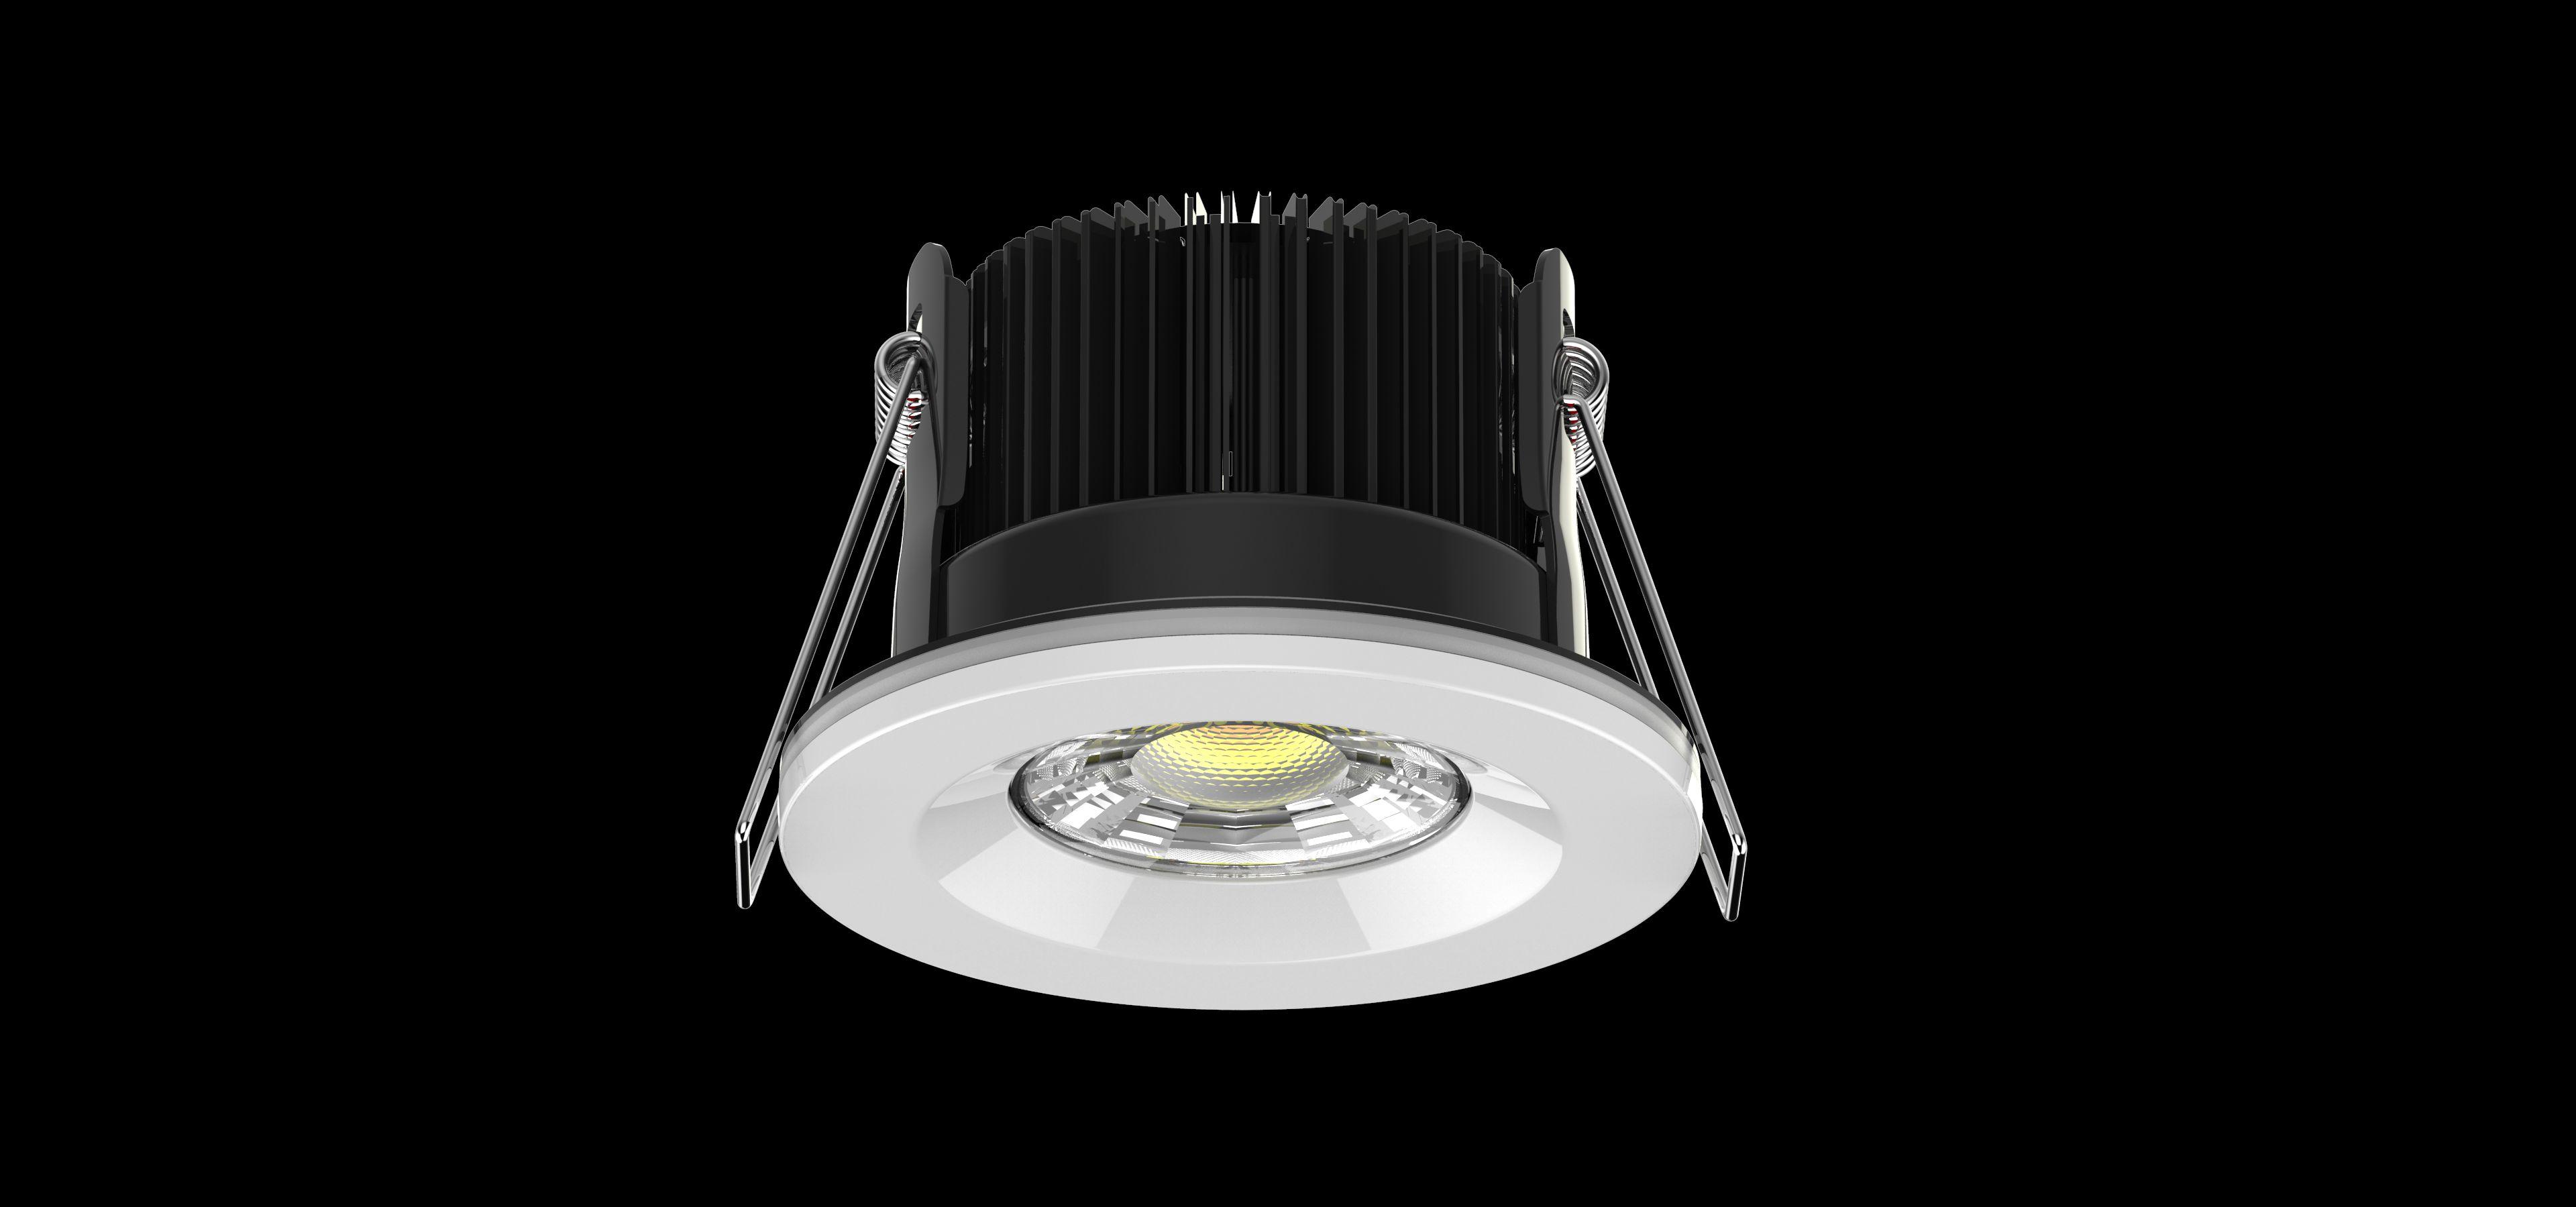 nordlicht beleuchtungssysteme gmbh nl cf10 68il rgb 240v ac led einbaustrahler mit. Black Bedroom Furniture Sets. Home Design Ideas